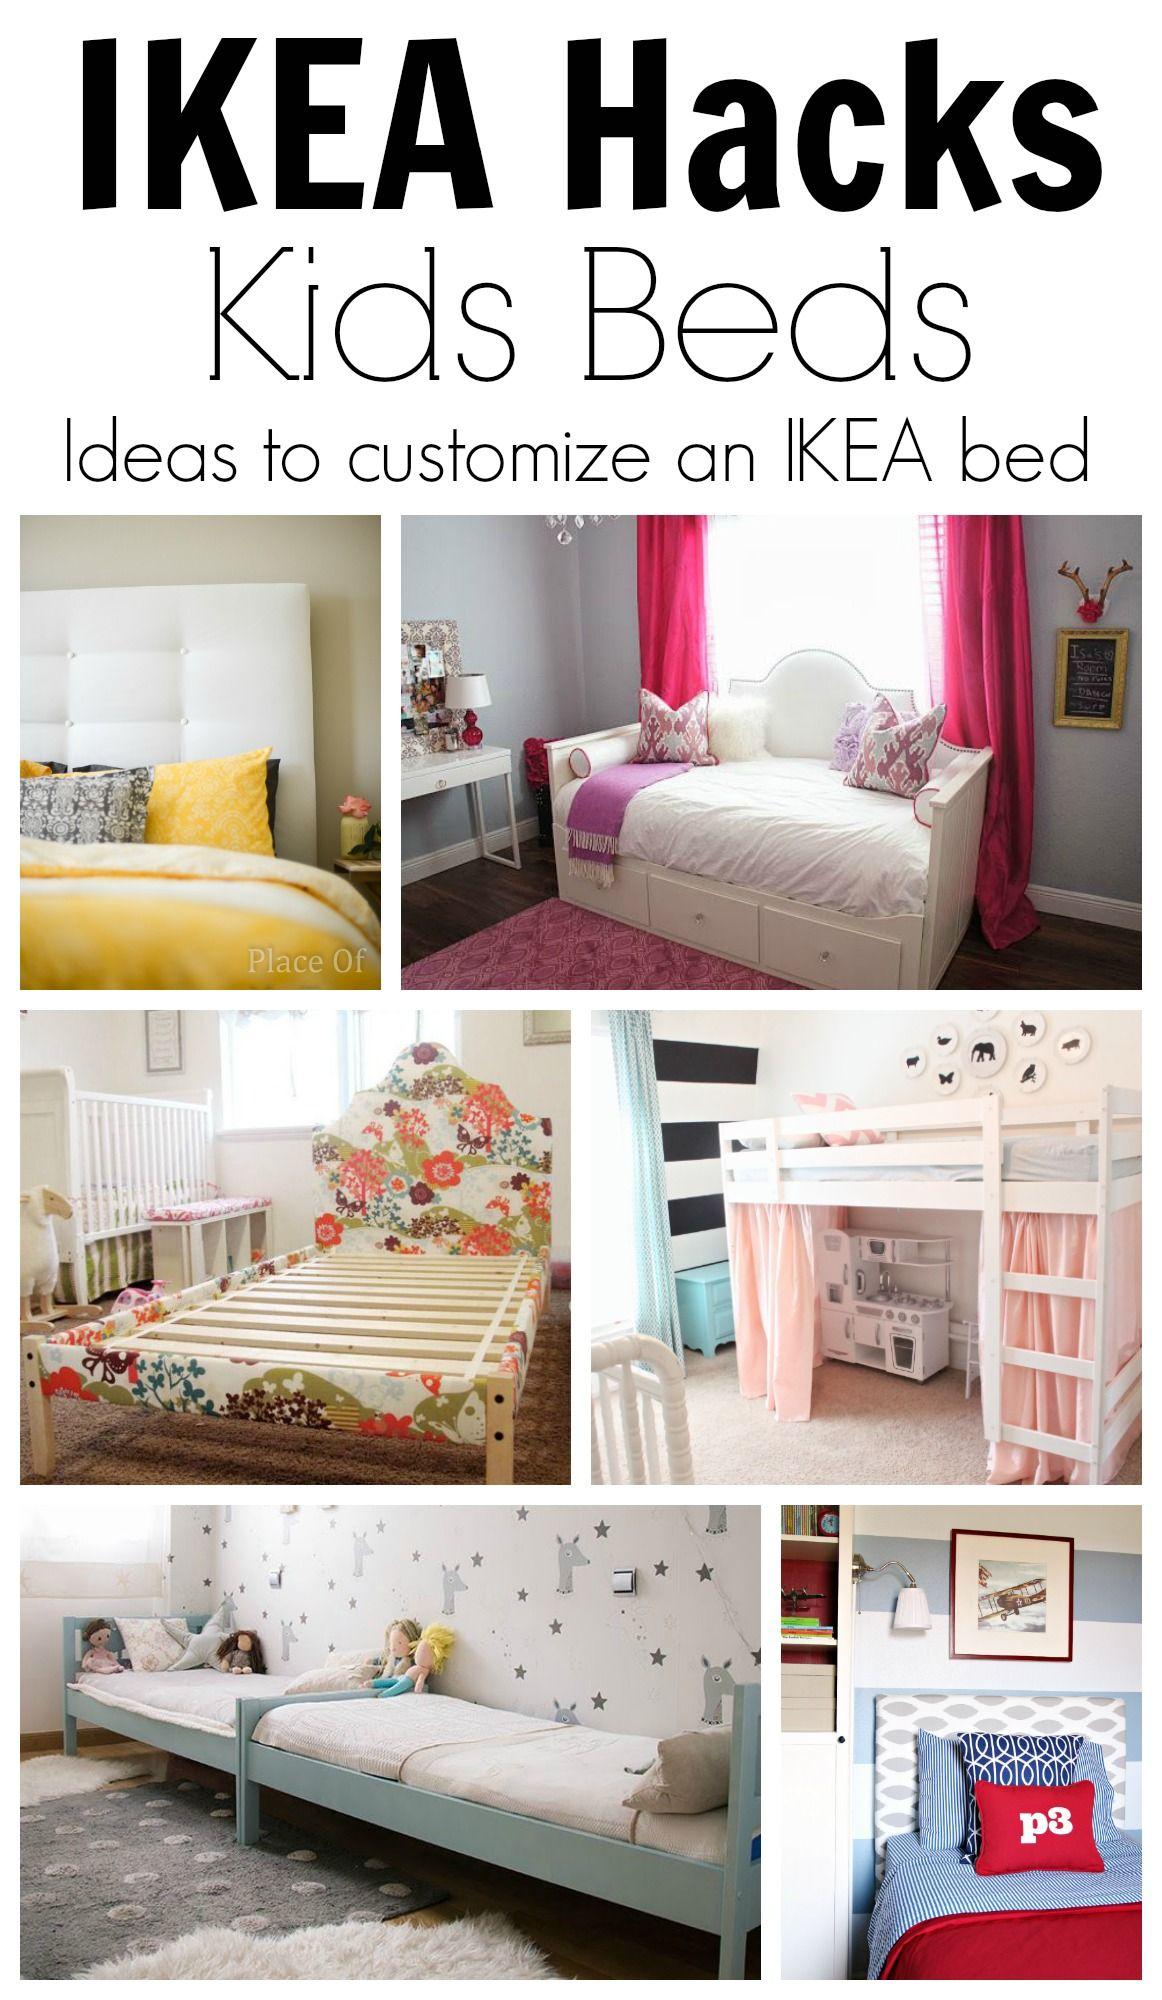 Page 2 - Decorating Design Pink Color Viendoraglass.com.